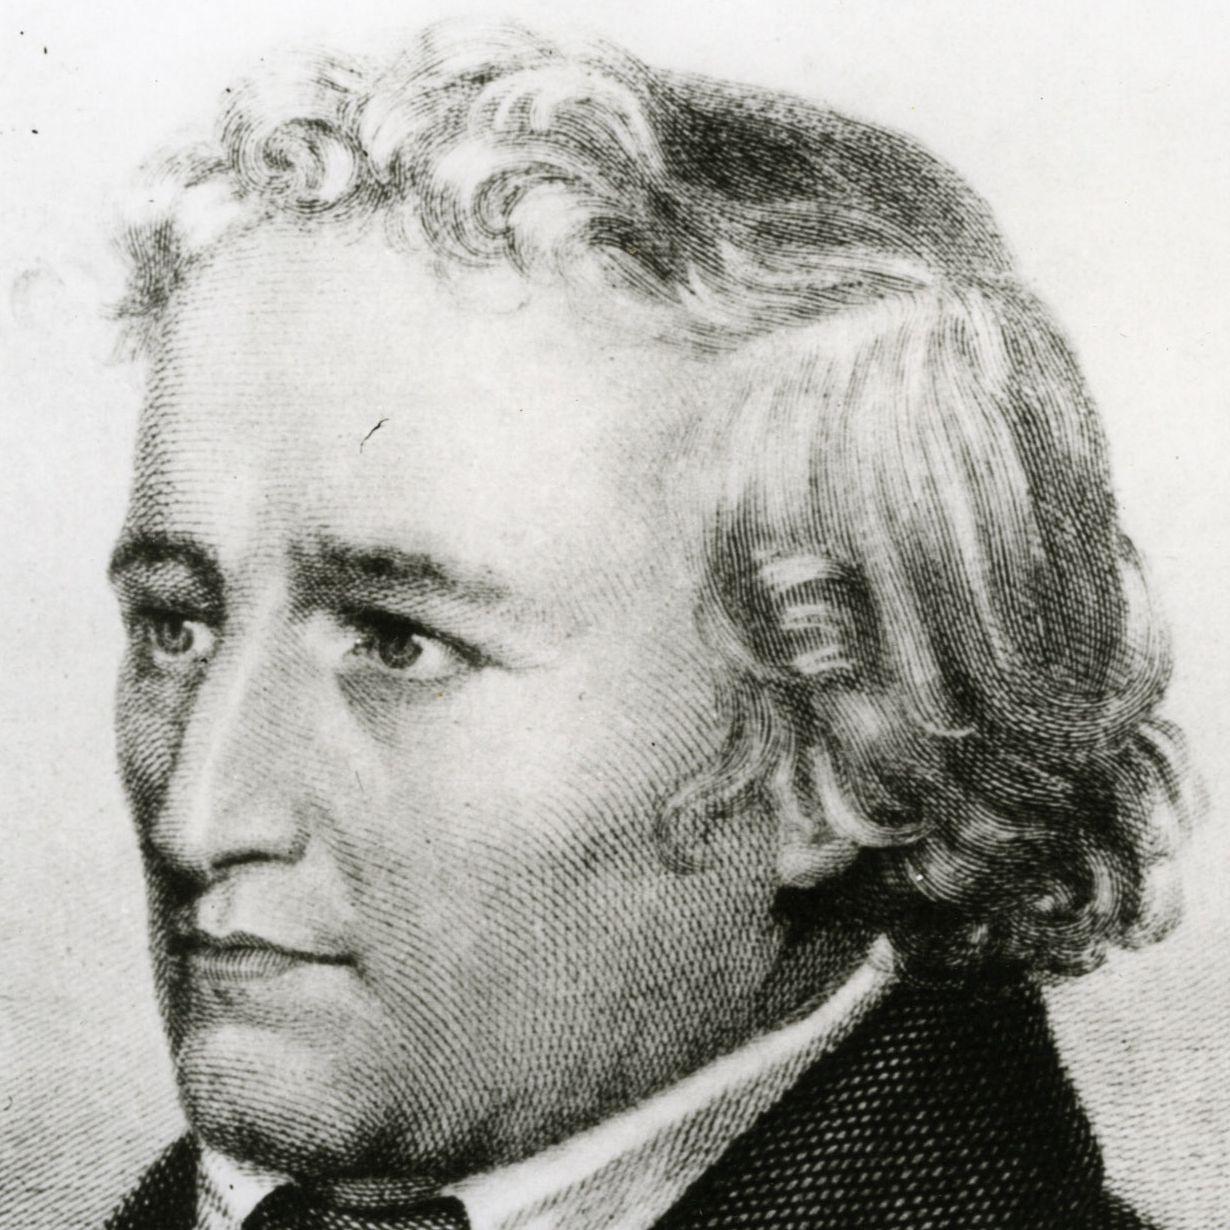 lemo biografie biografie jacob grimm - Gebruder Grimm Lebenslauf